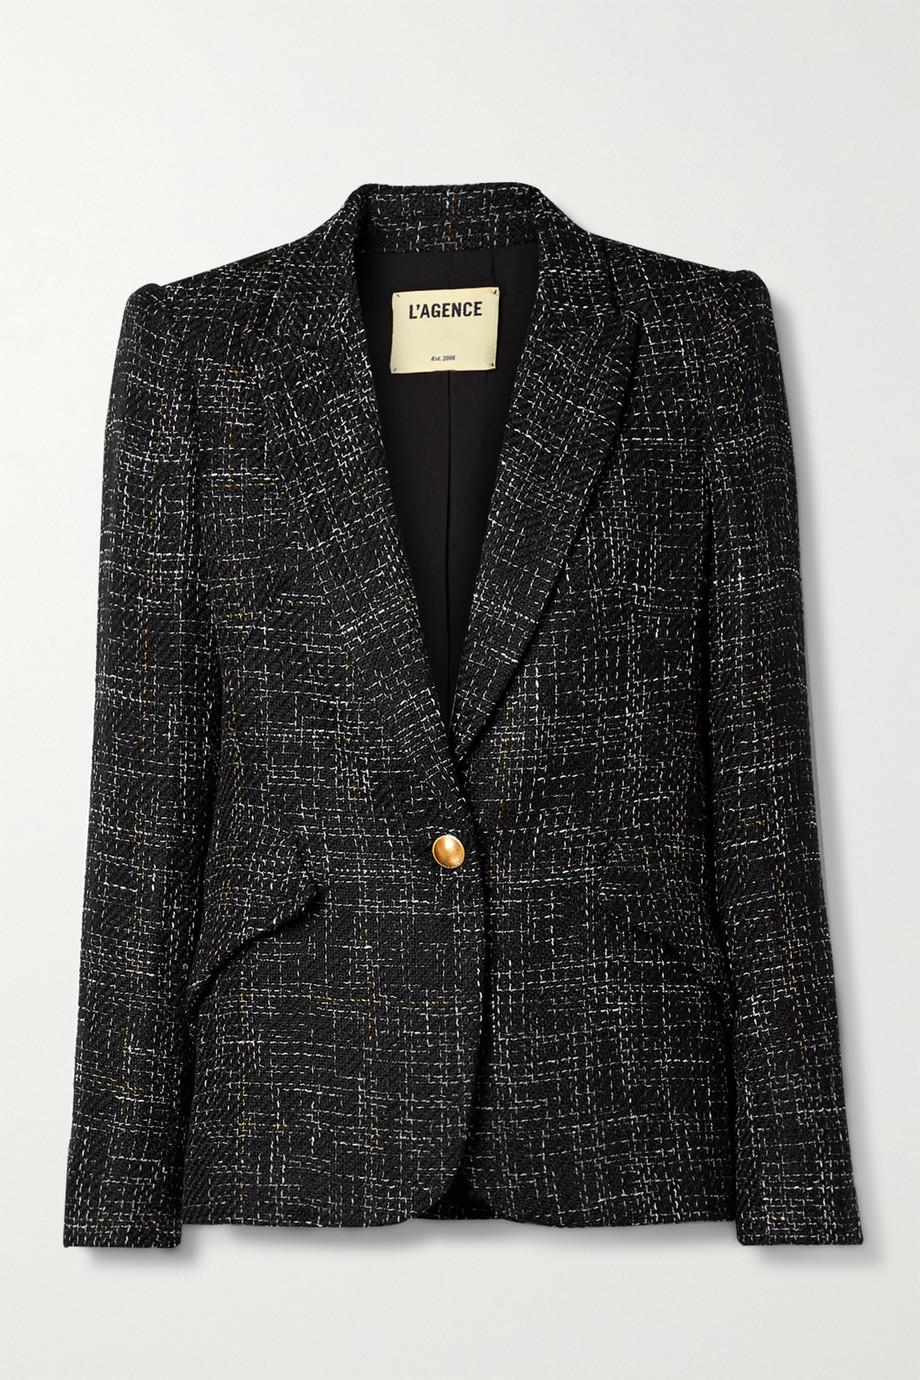 L'Agence Chamberlain checked tweed blazer